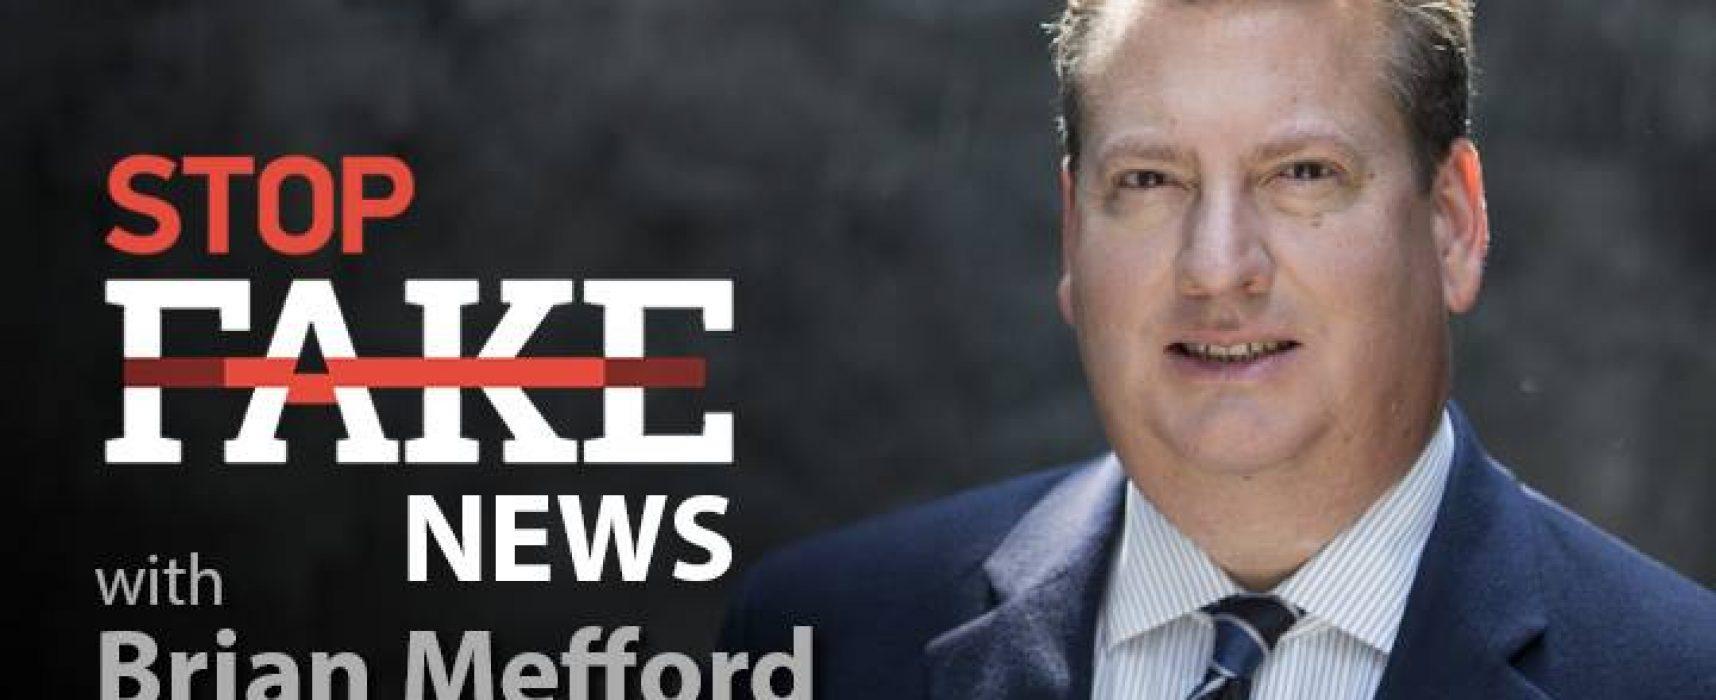 StopFakeNews #84 with Brian Mefford